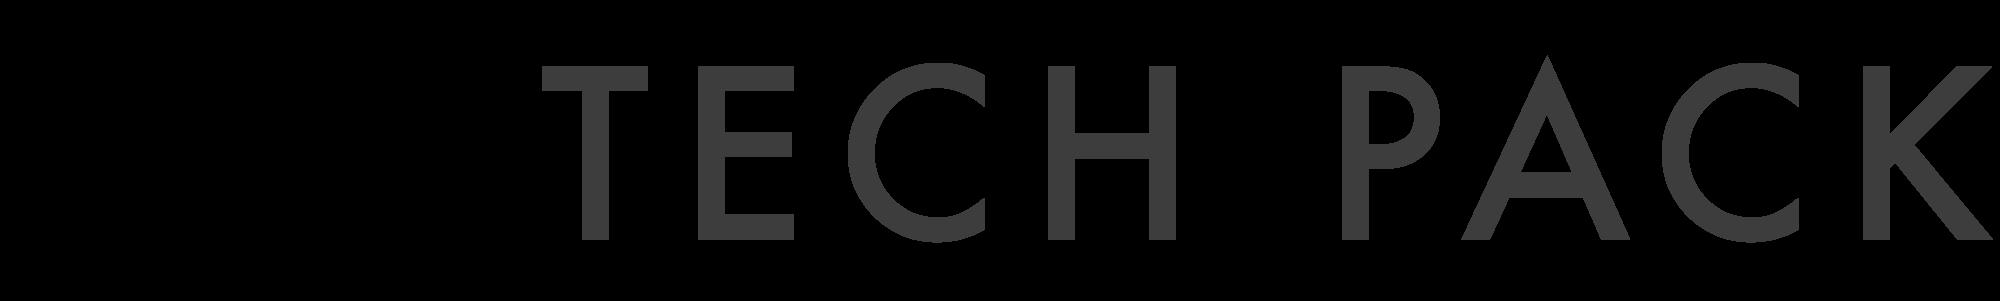 TDS-Website-Titles-H1-TECH PACK.png